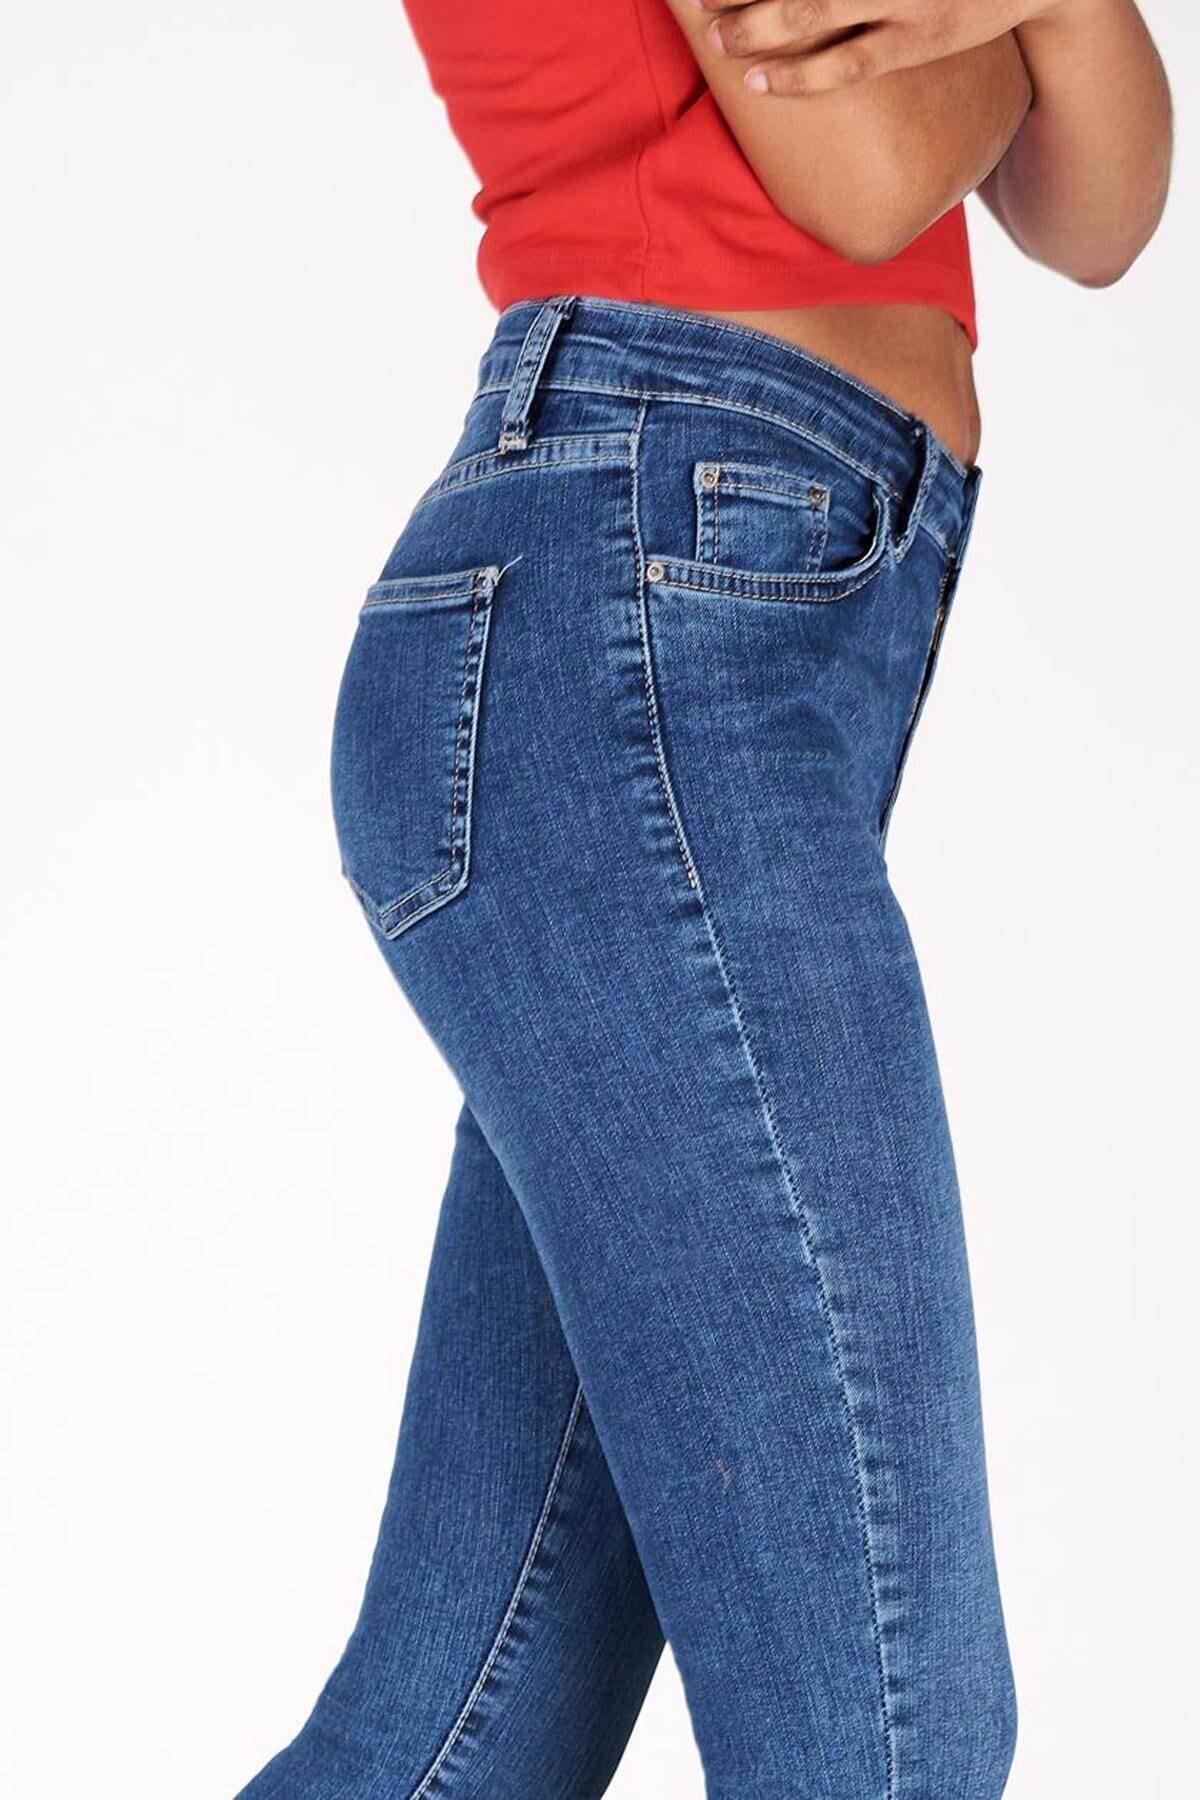 Addax Kadın Kot Rengi Orta Bel Pantolon Pn5799 - Pnr ADX-0000016979 3